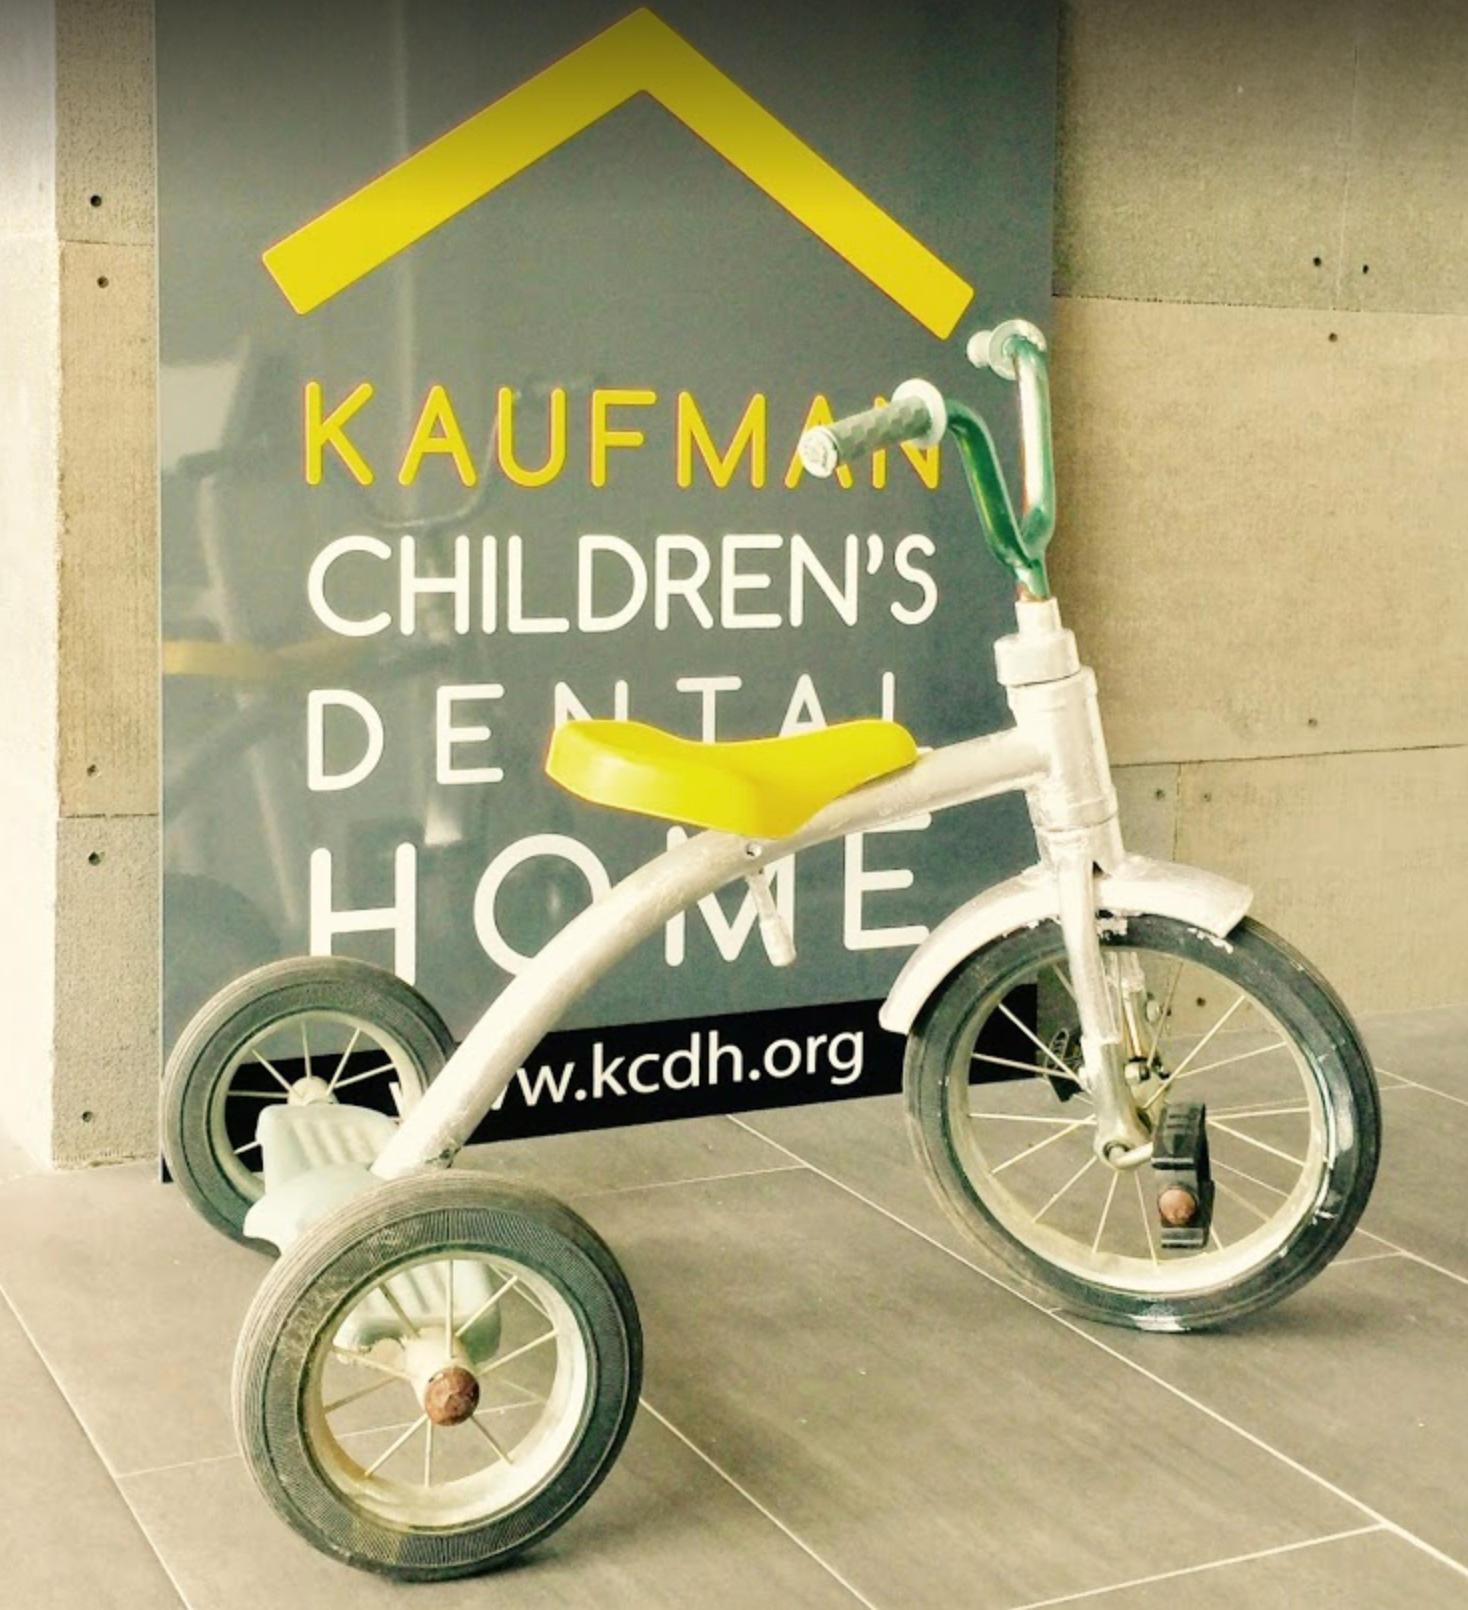 Kaufman Children's Dental Hospital Brooklyn New York 2120